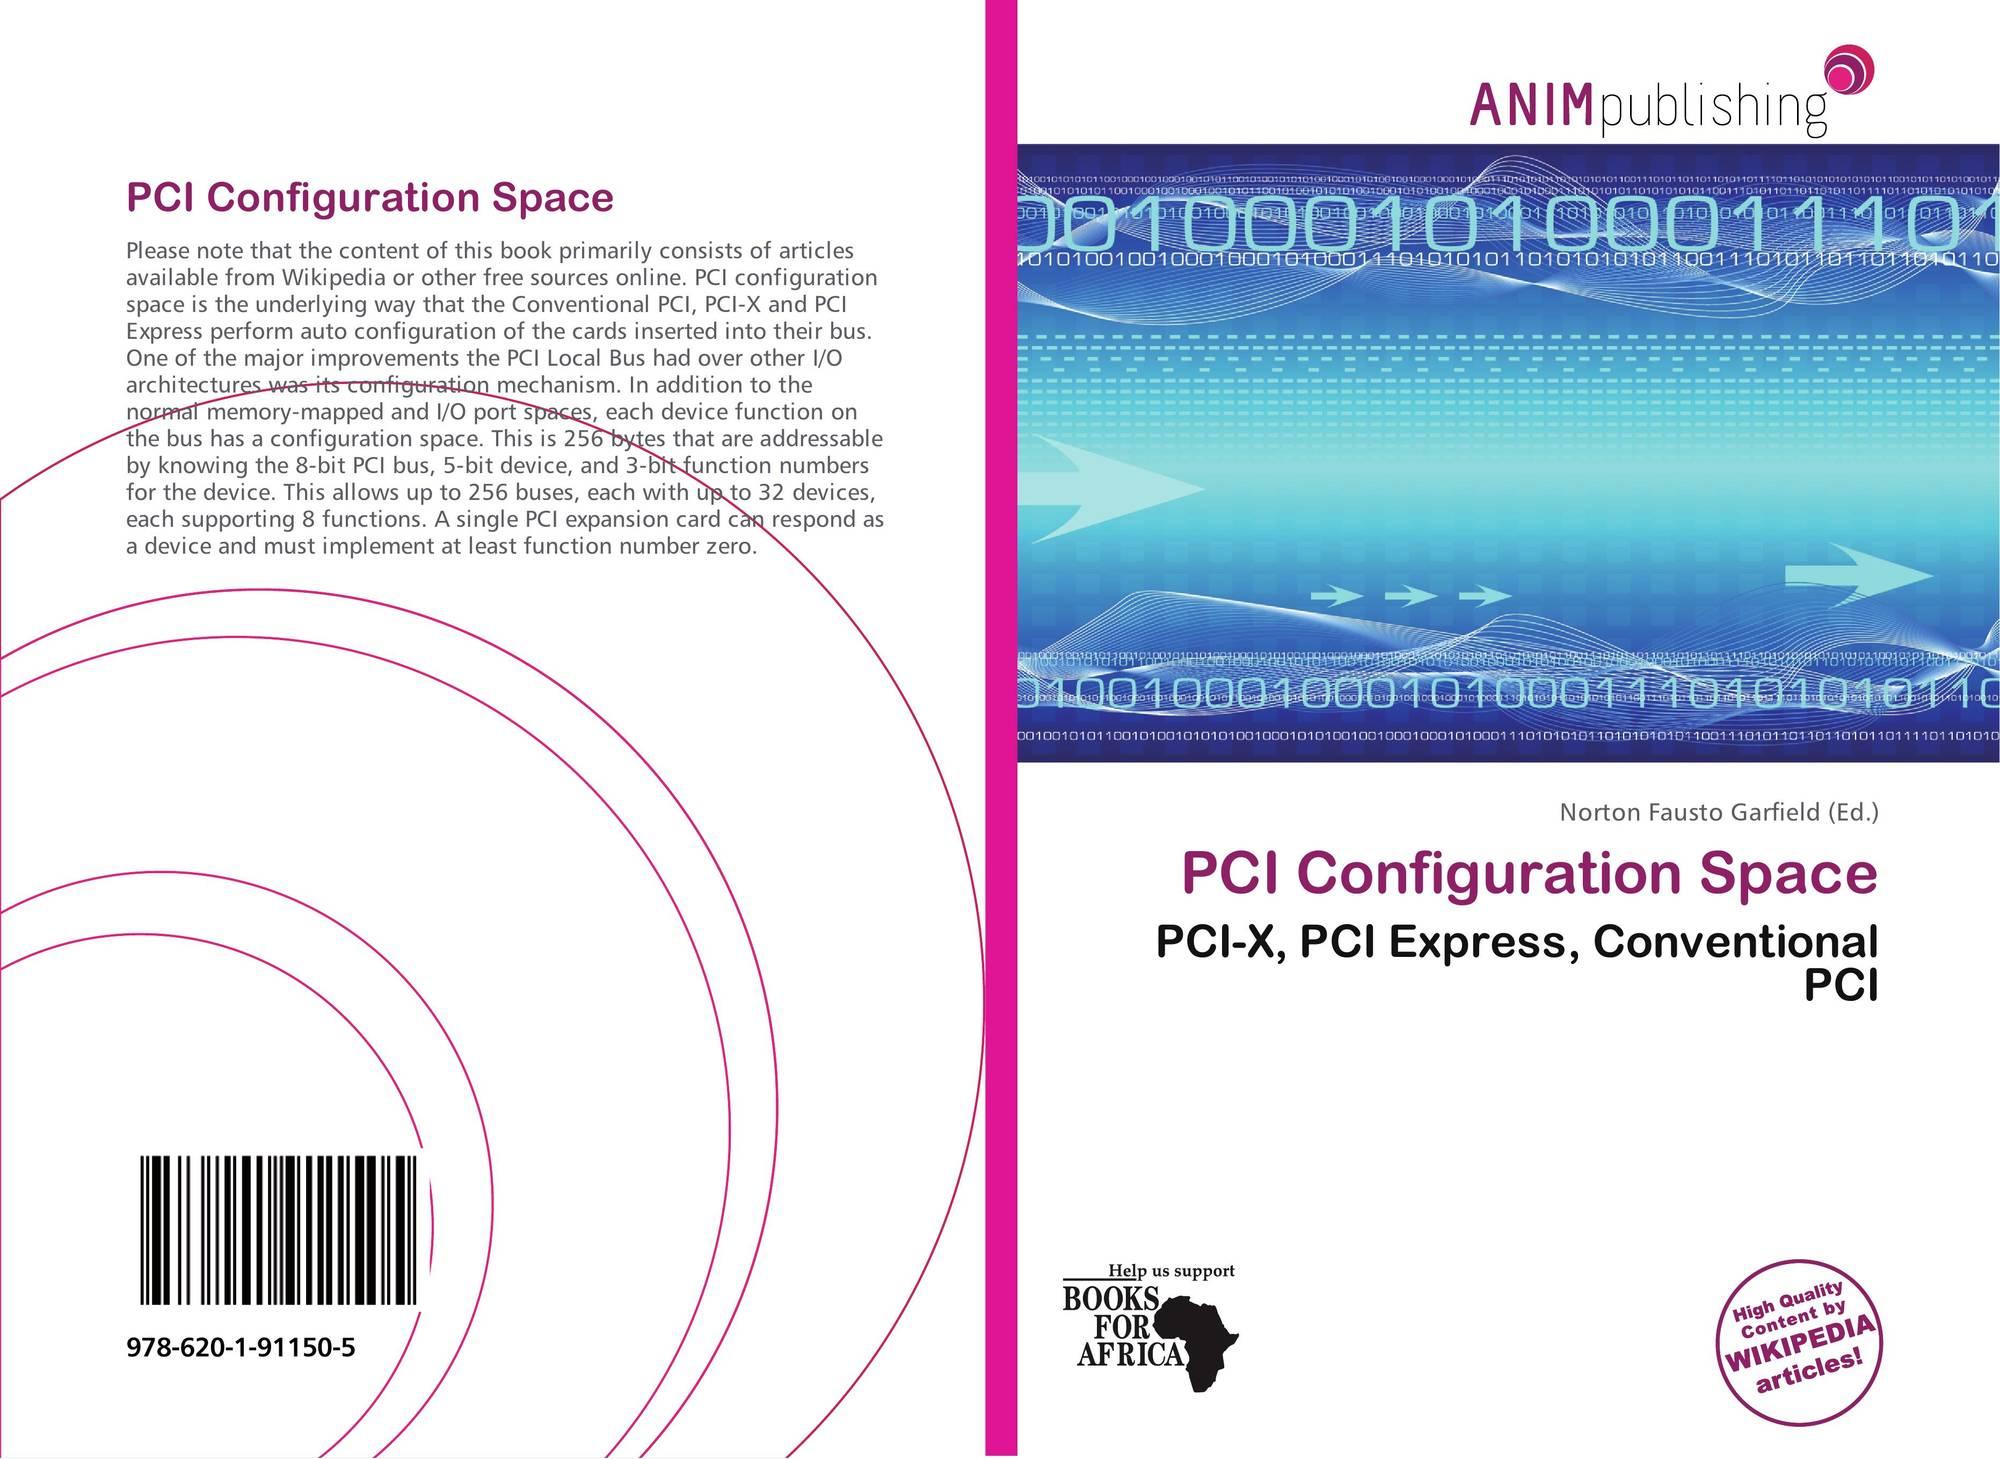 PCI Configuration Space, 978-620-1-91150-5, 6201911502